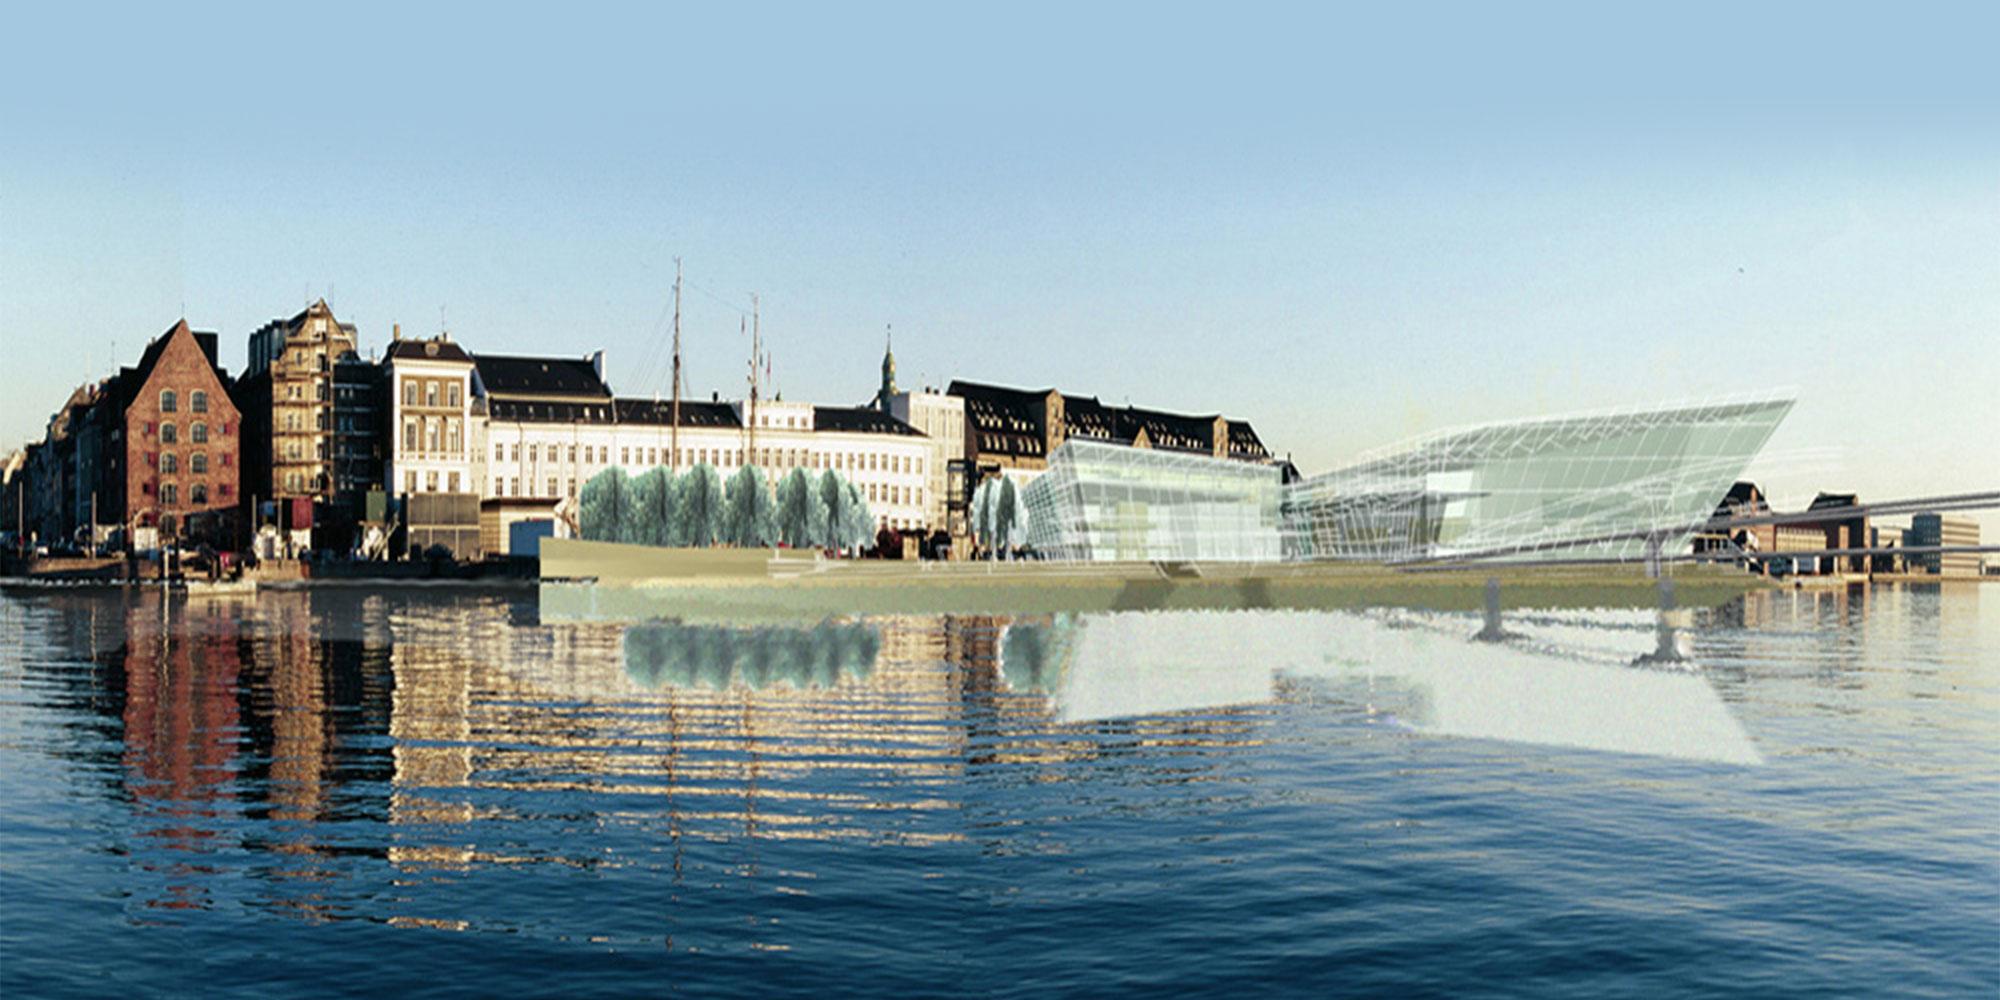 Kongelige Theater, Opera House Concept